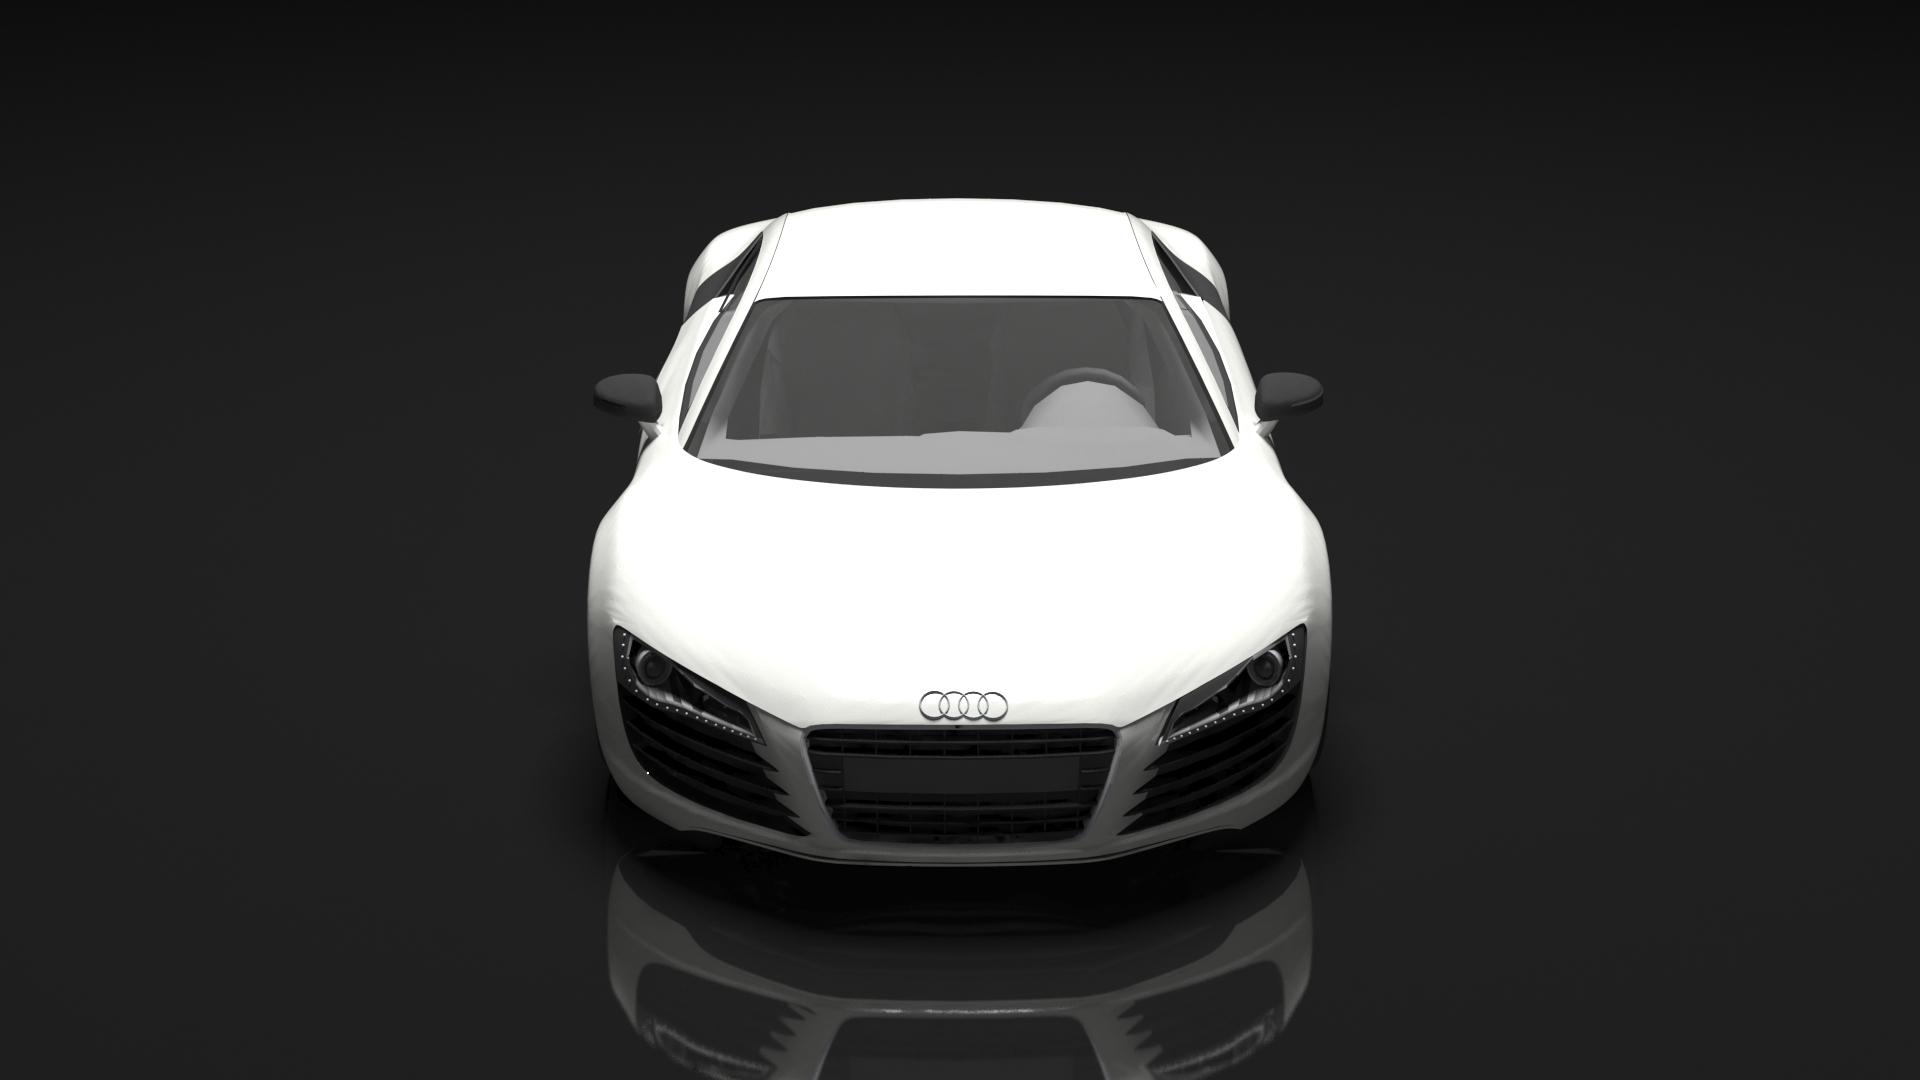 Audi r8 model 3d model  265034